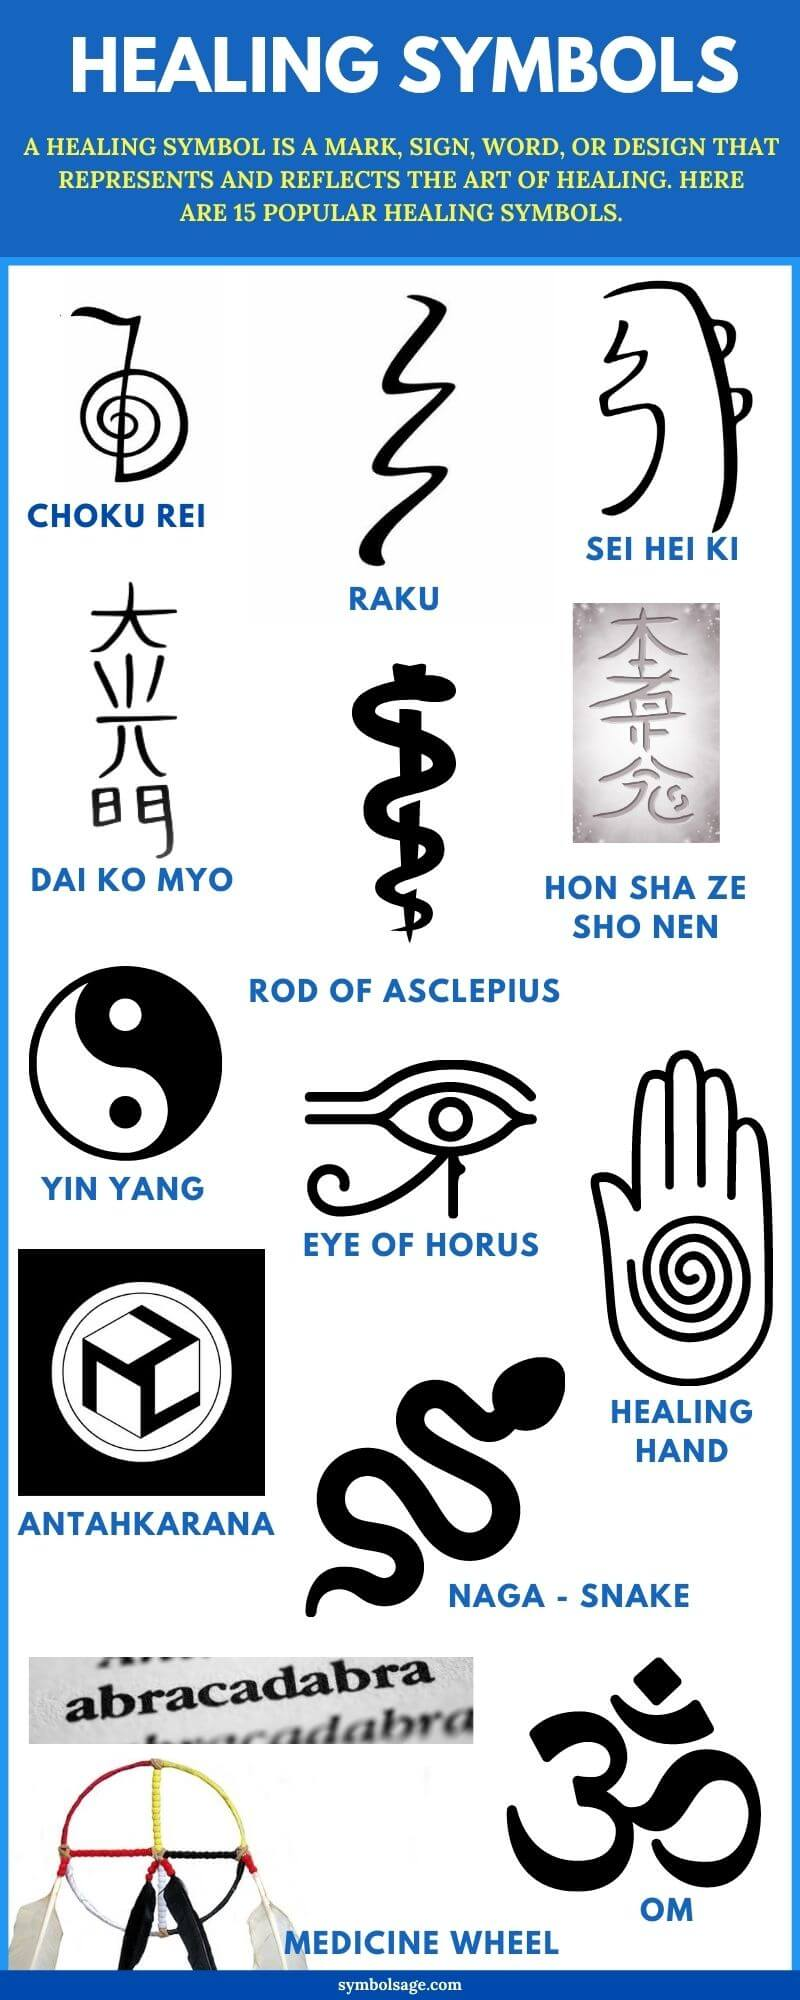 List of healing symbols